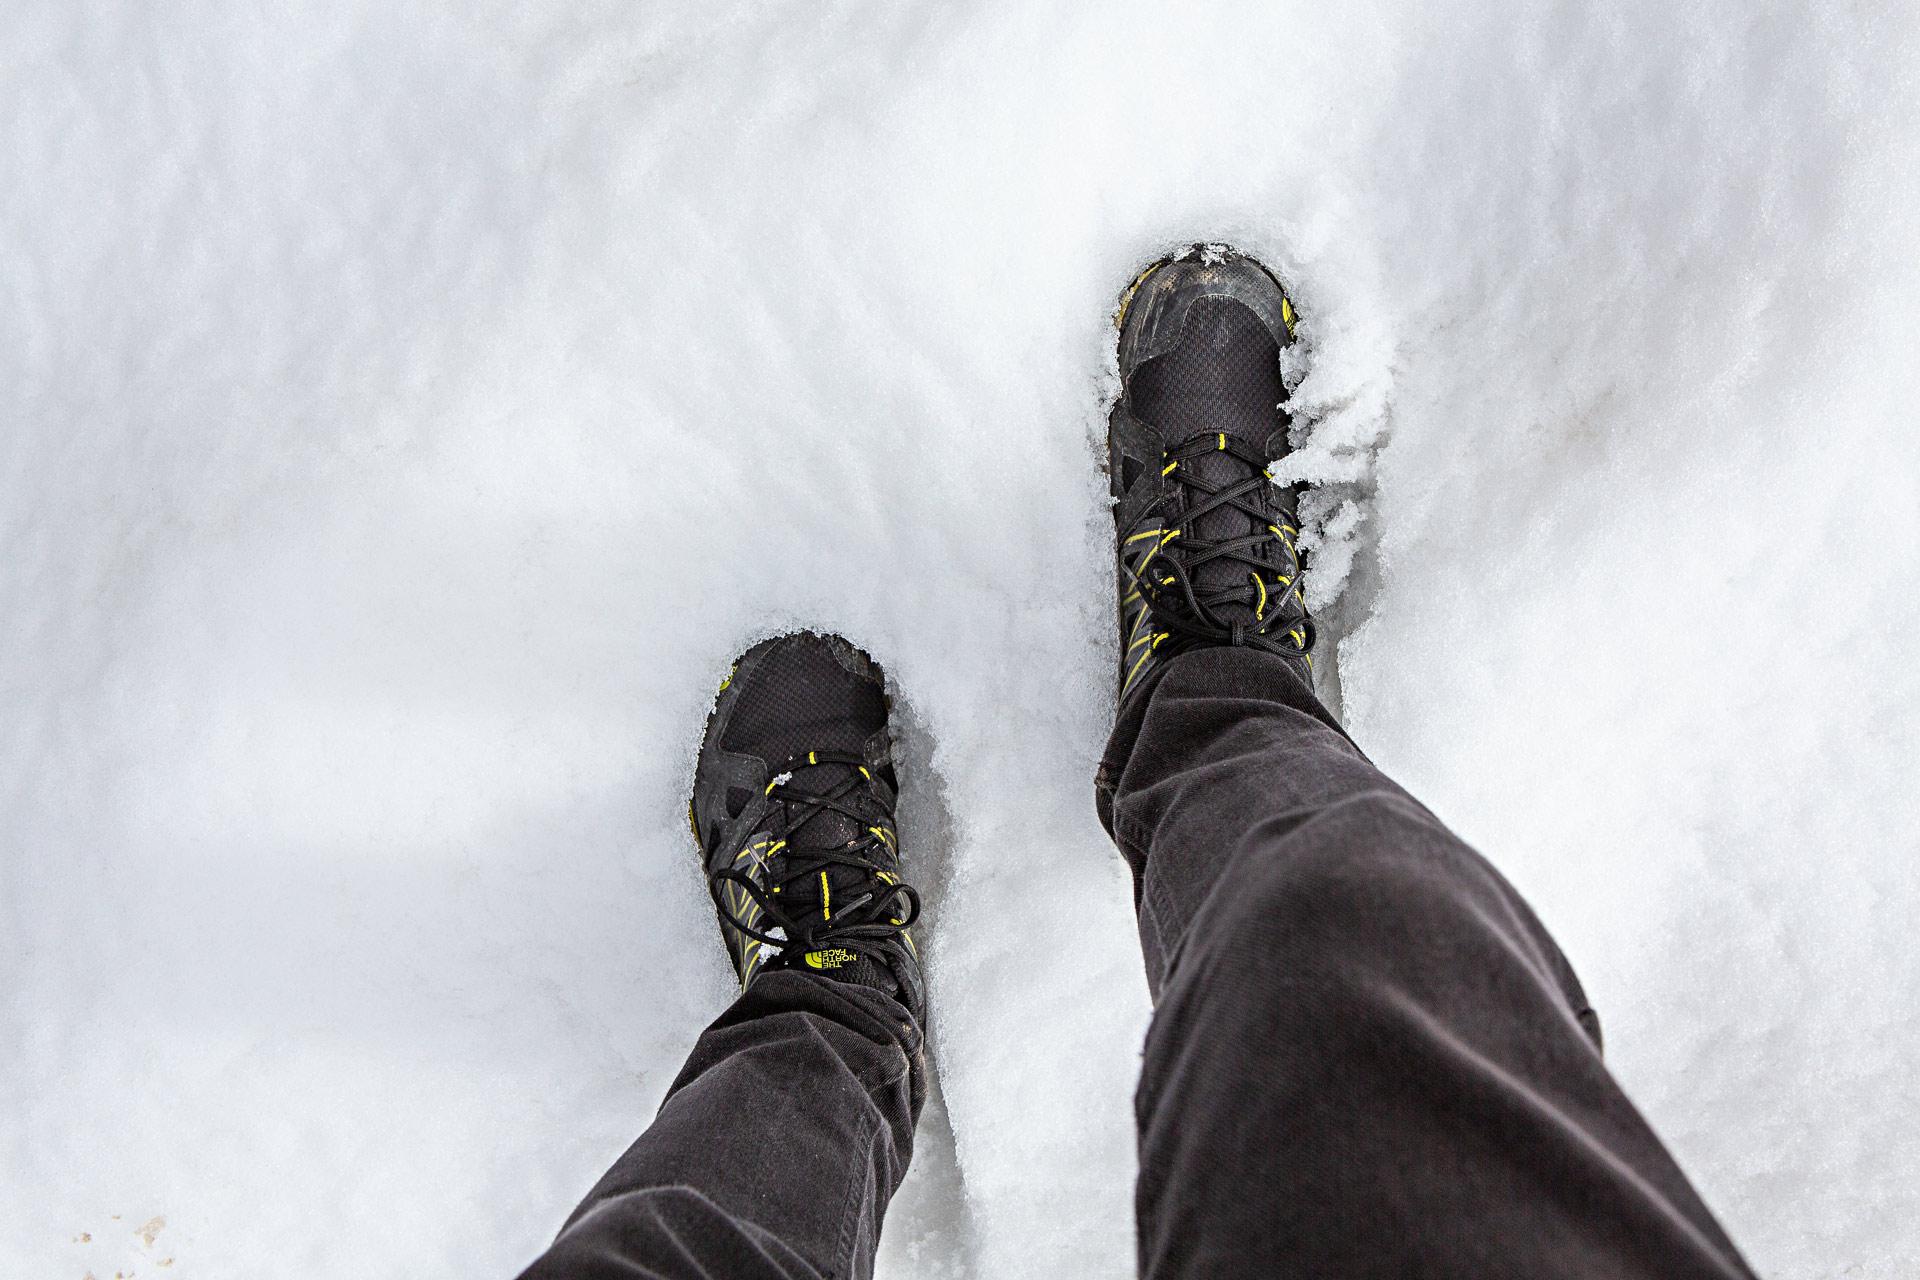 Neige Sentinel Pass Banff Canada randonnée